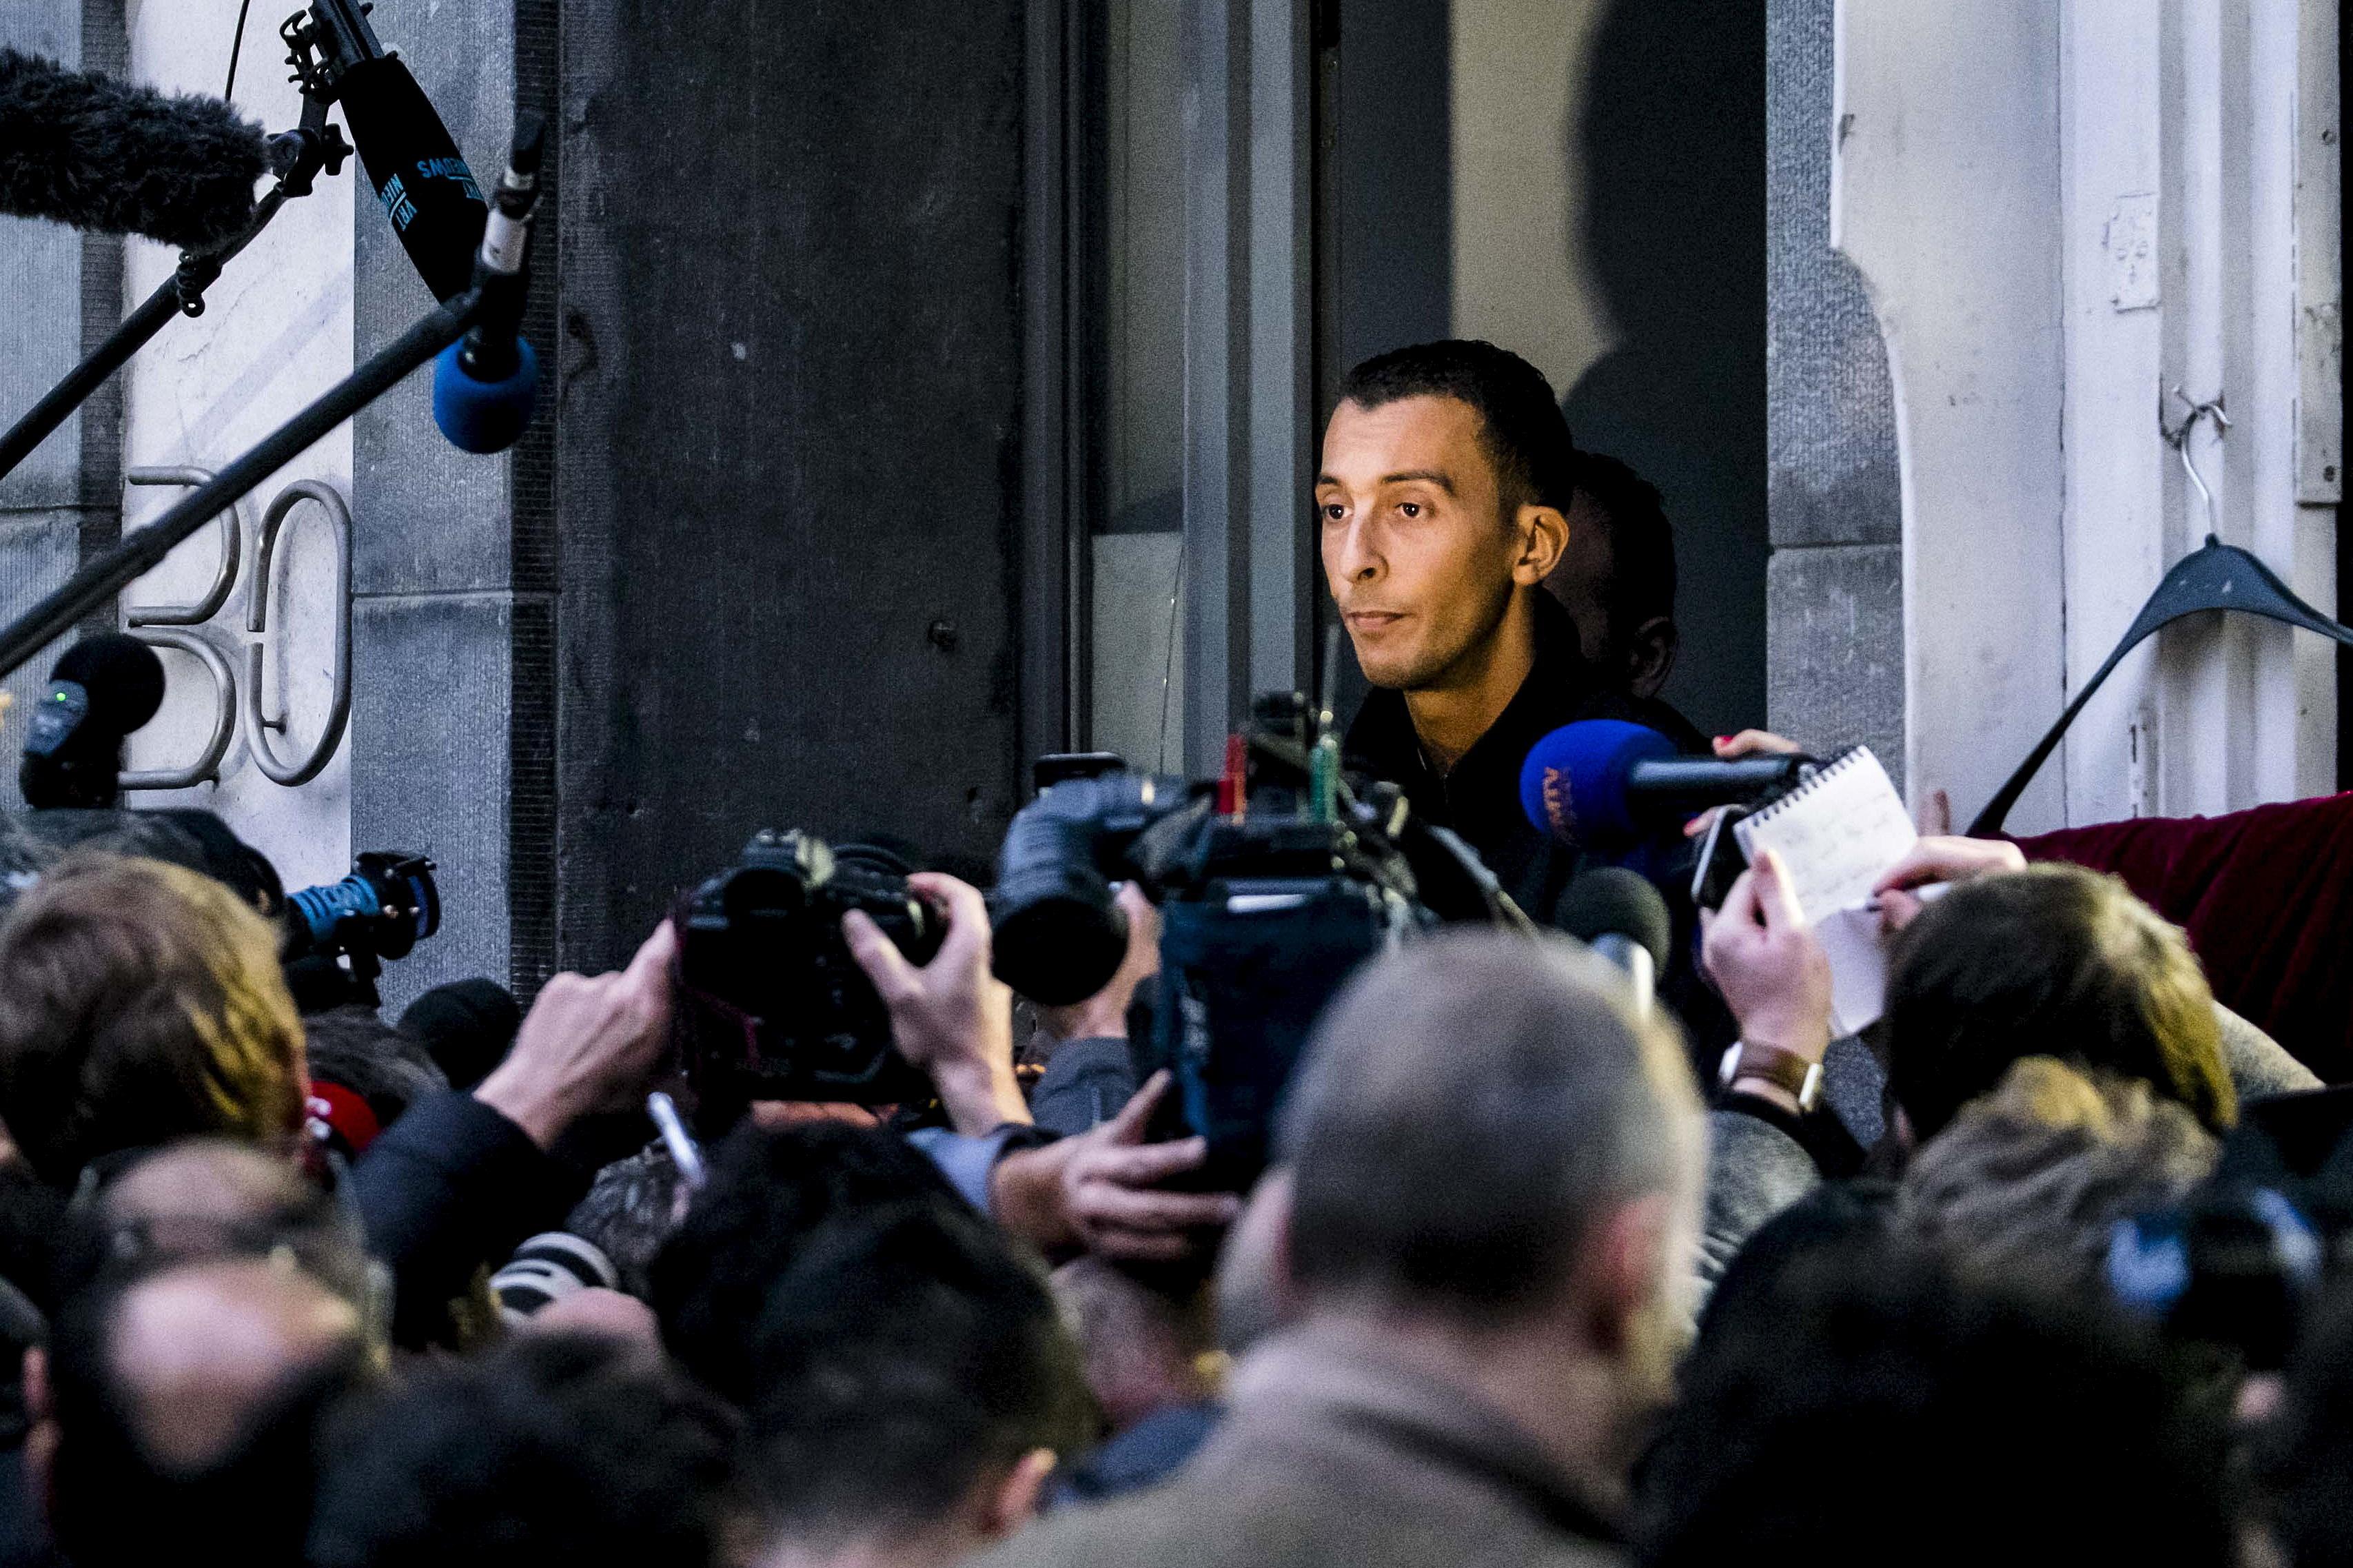 Brother Of Paris Terror Suspect Wants Him To Surrender